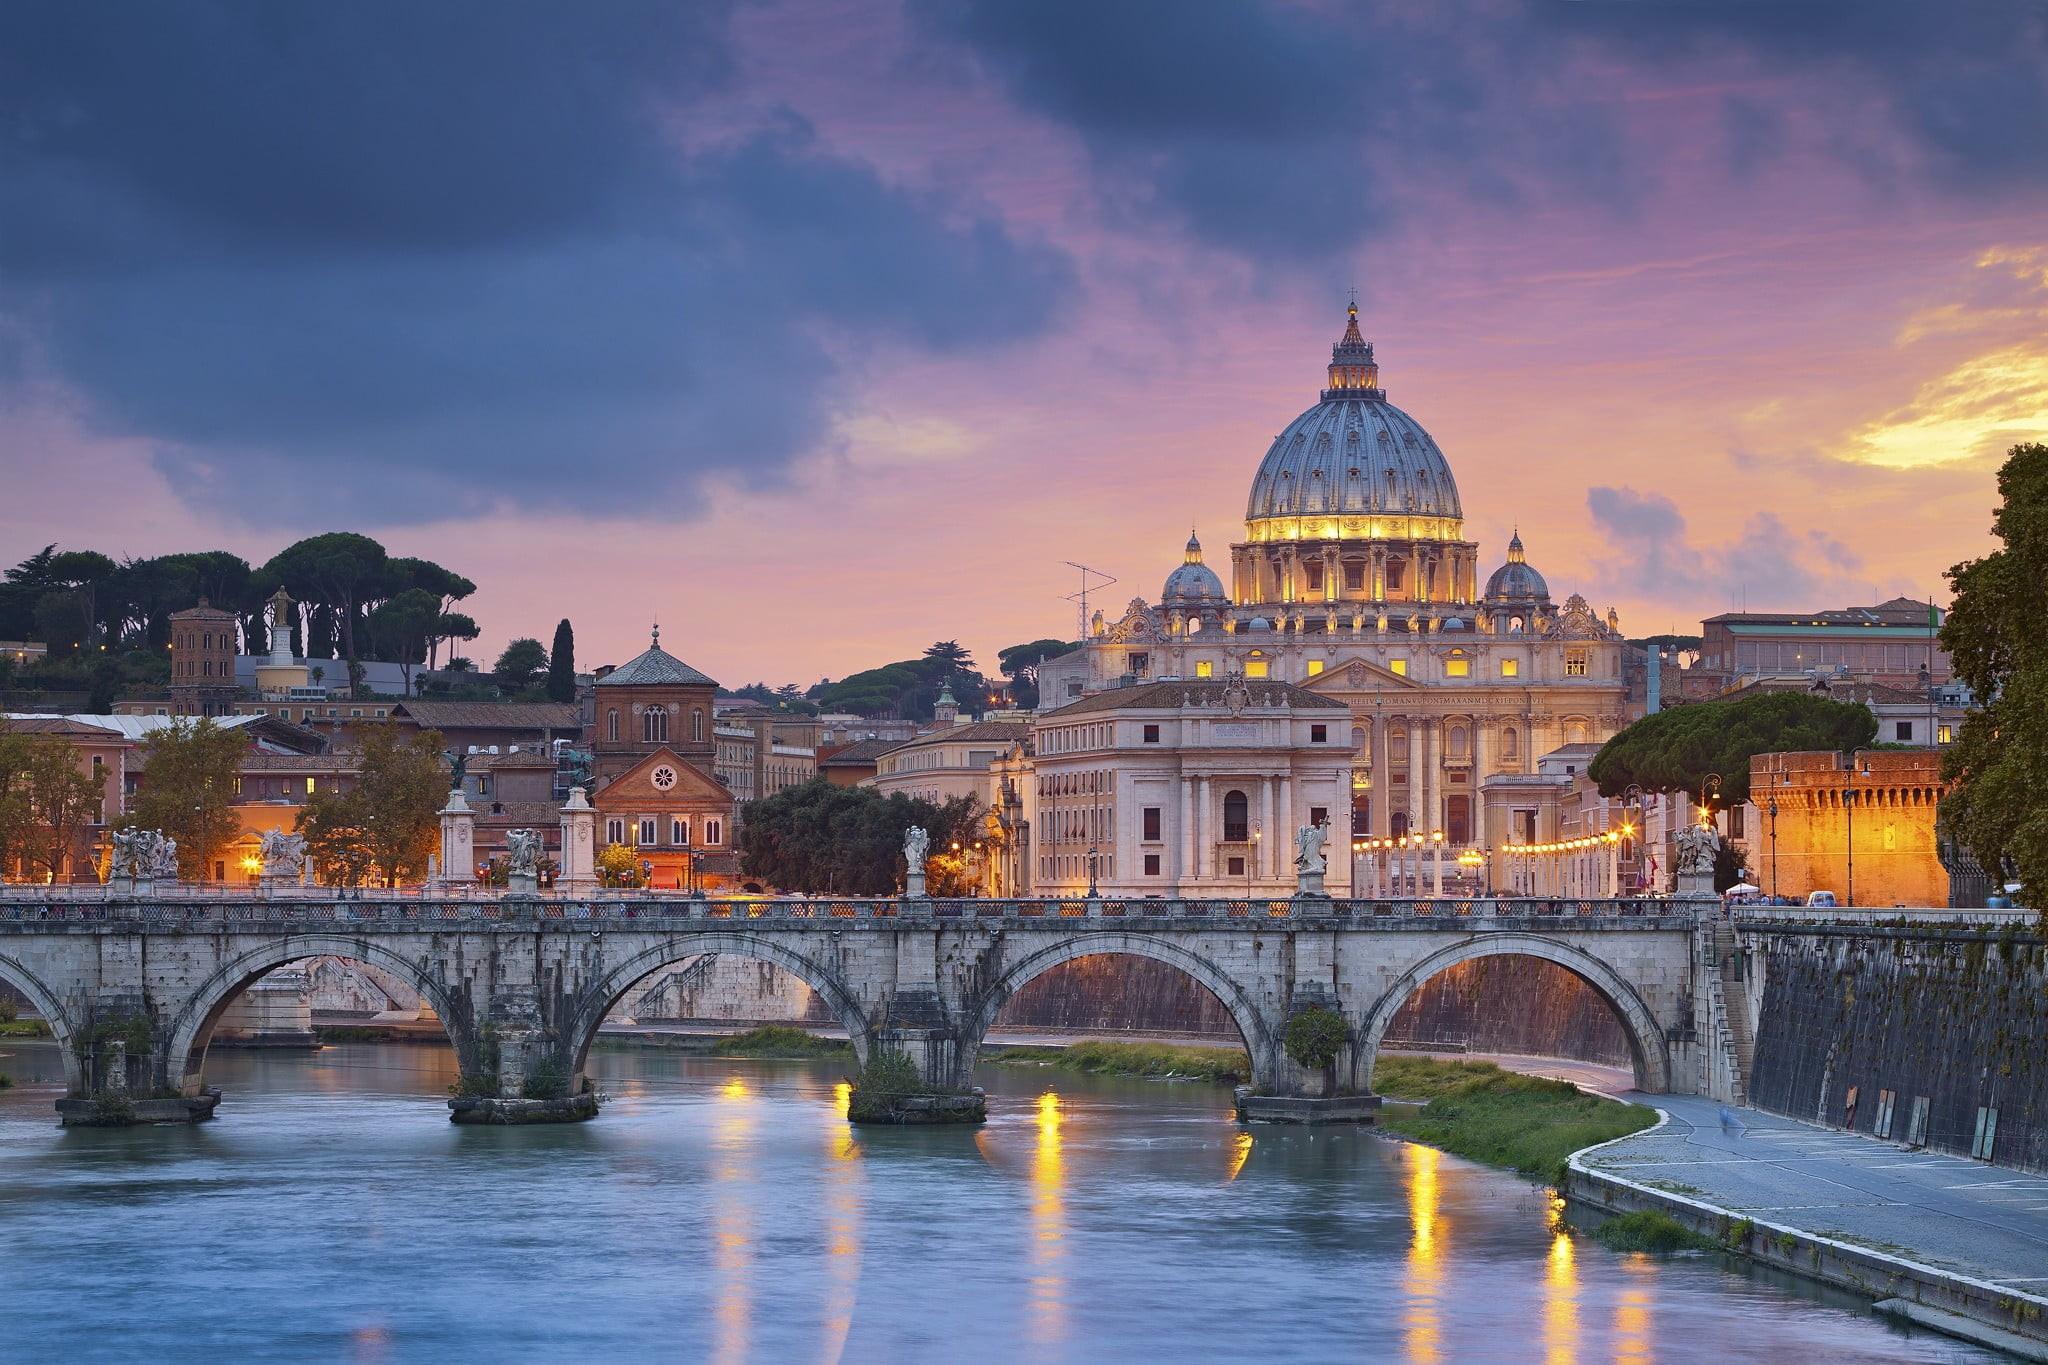 Res: 2048x1365, gray concrete bridge, Rome, Italy, Vatican City, cathedral HD wallpaper